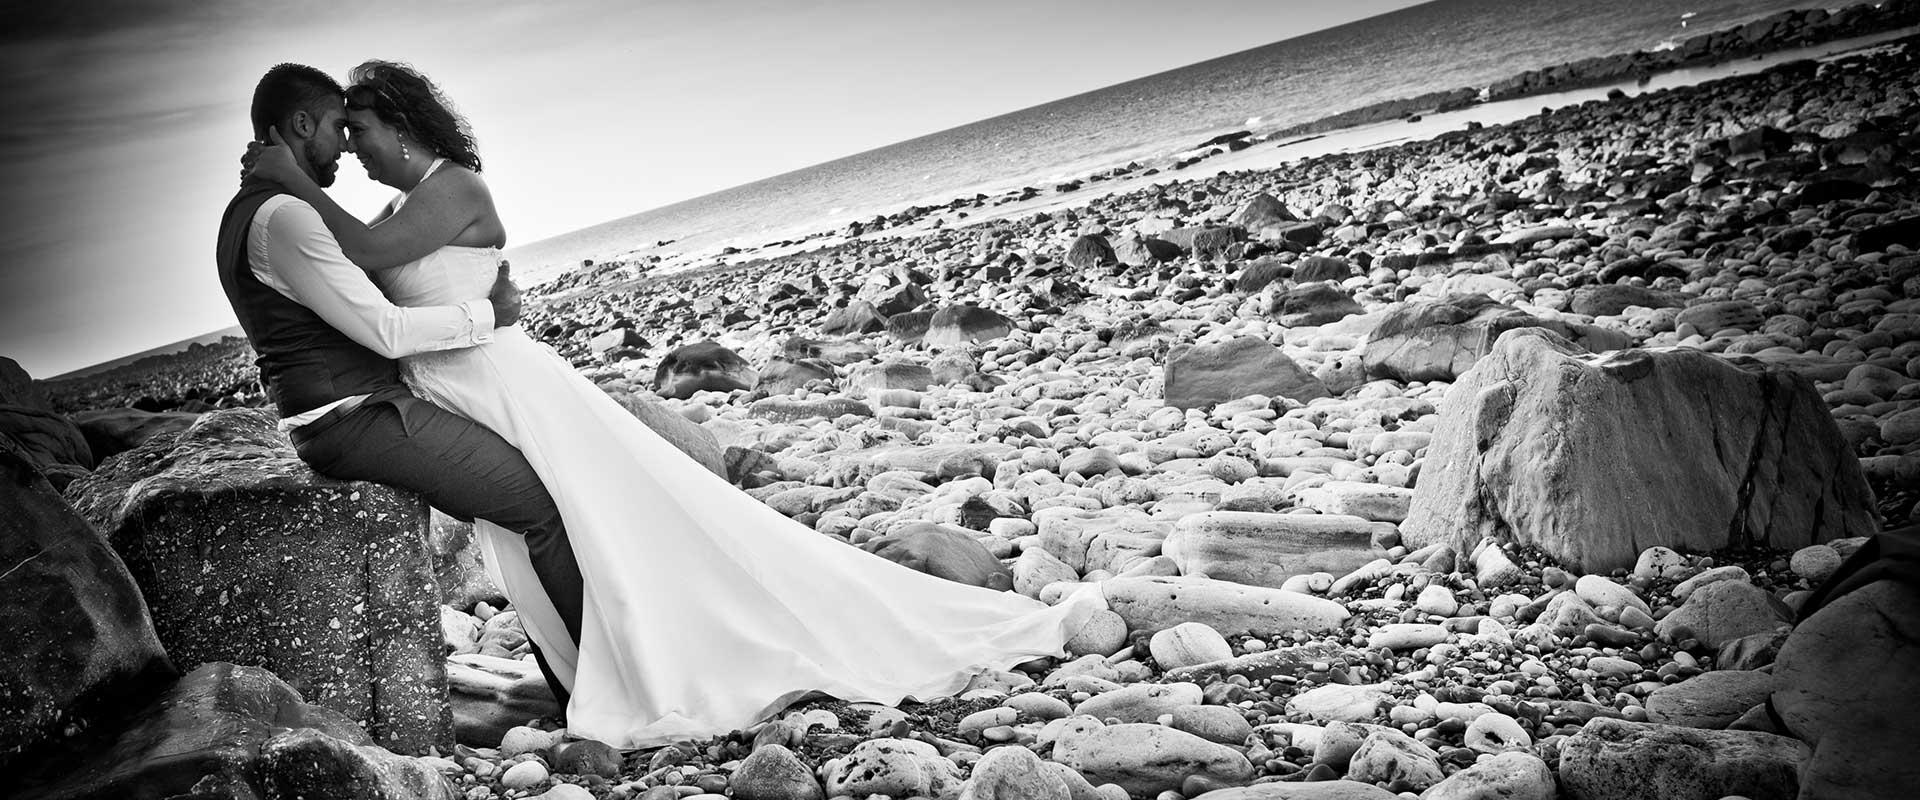 photographe-mariage-14-villers-calvados